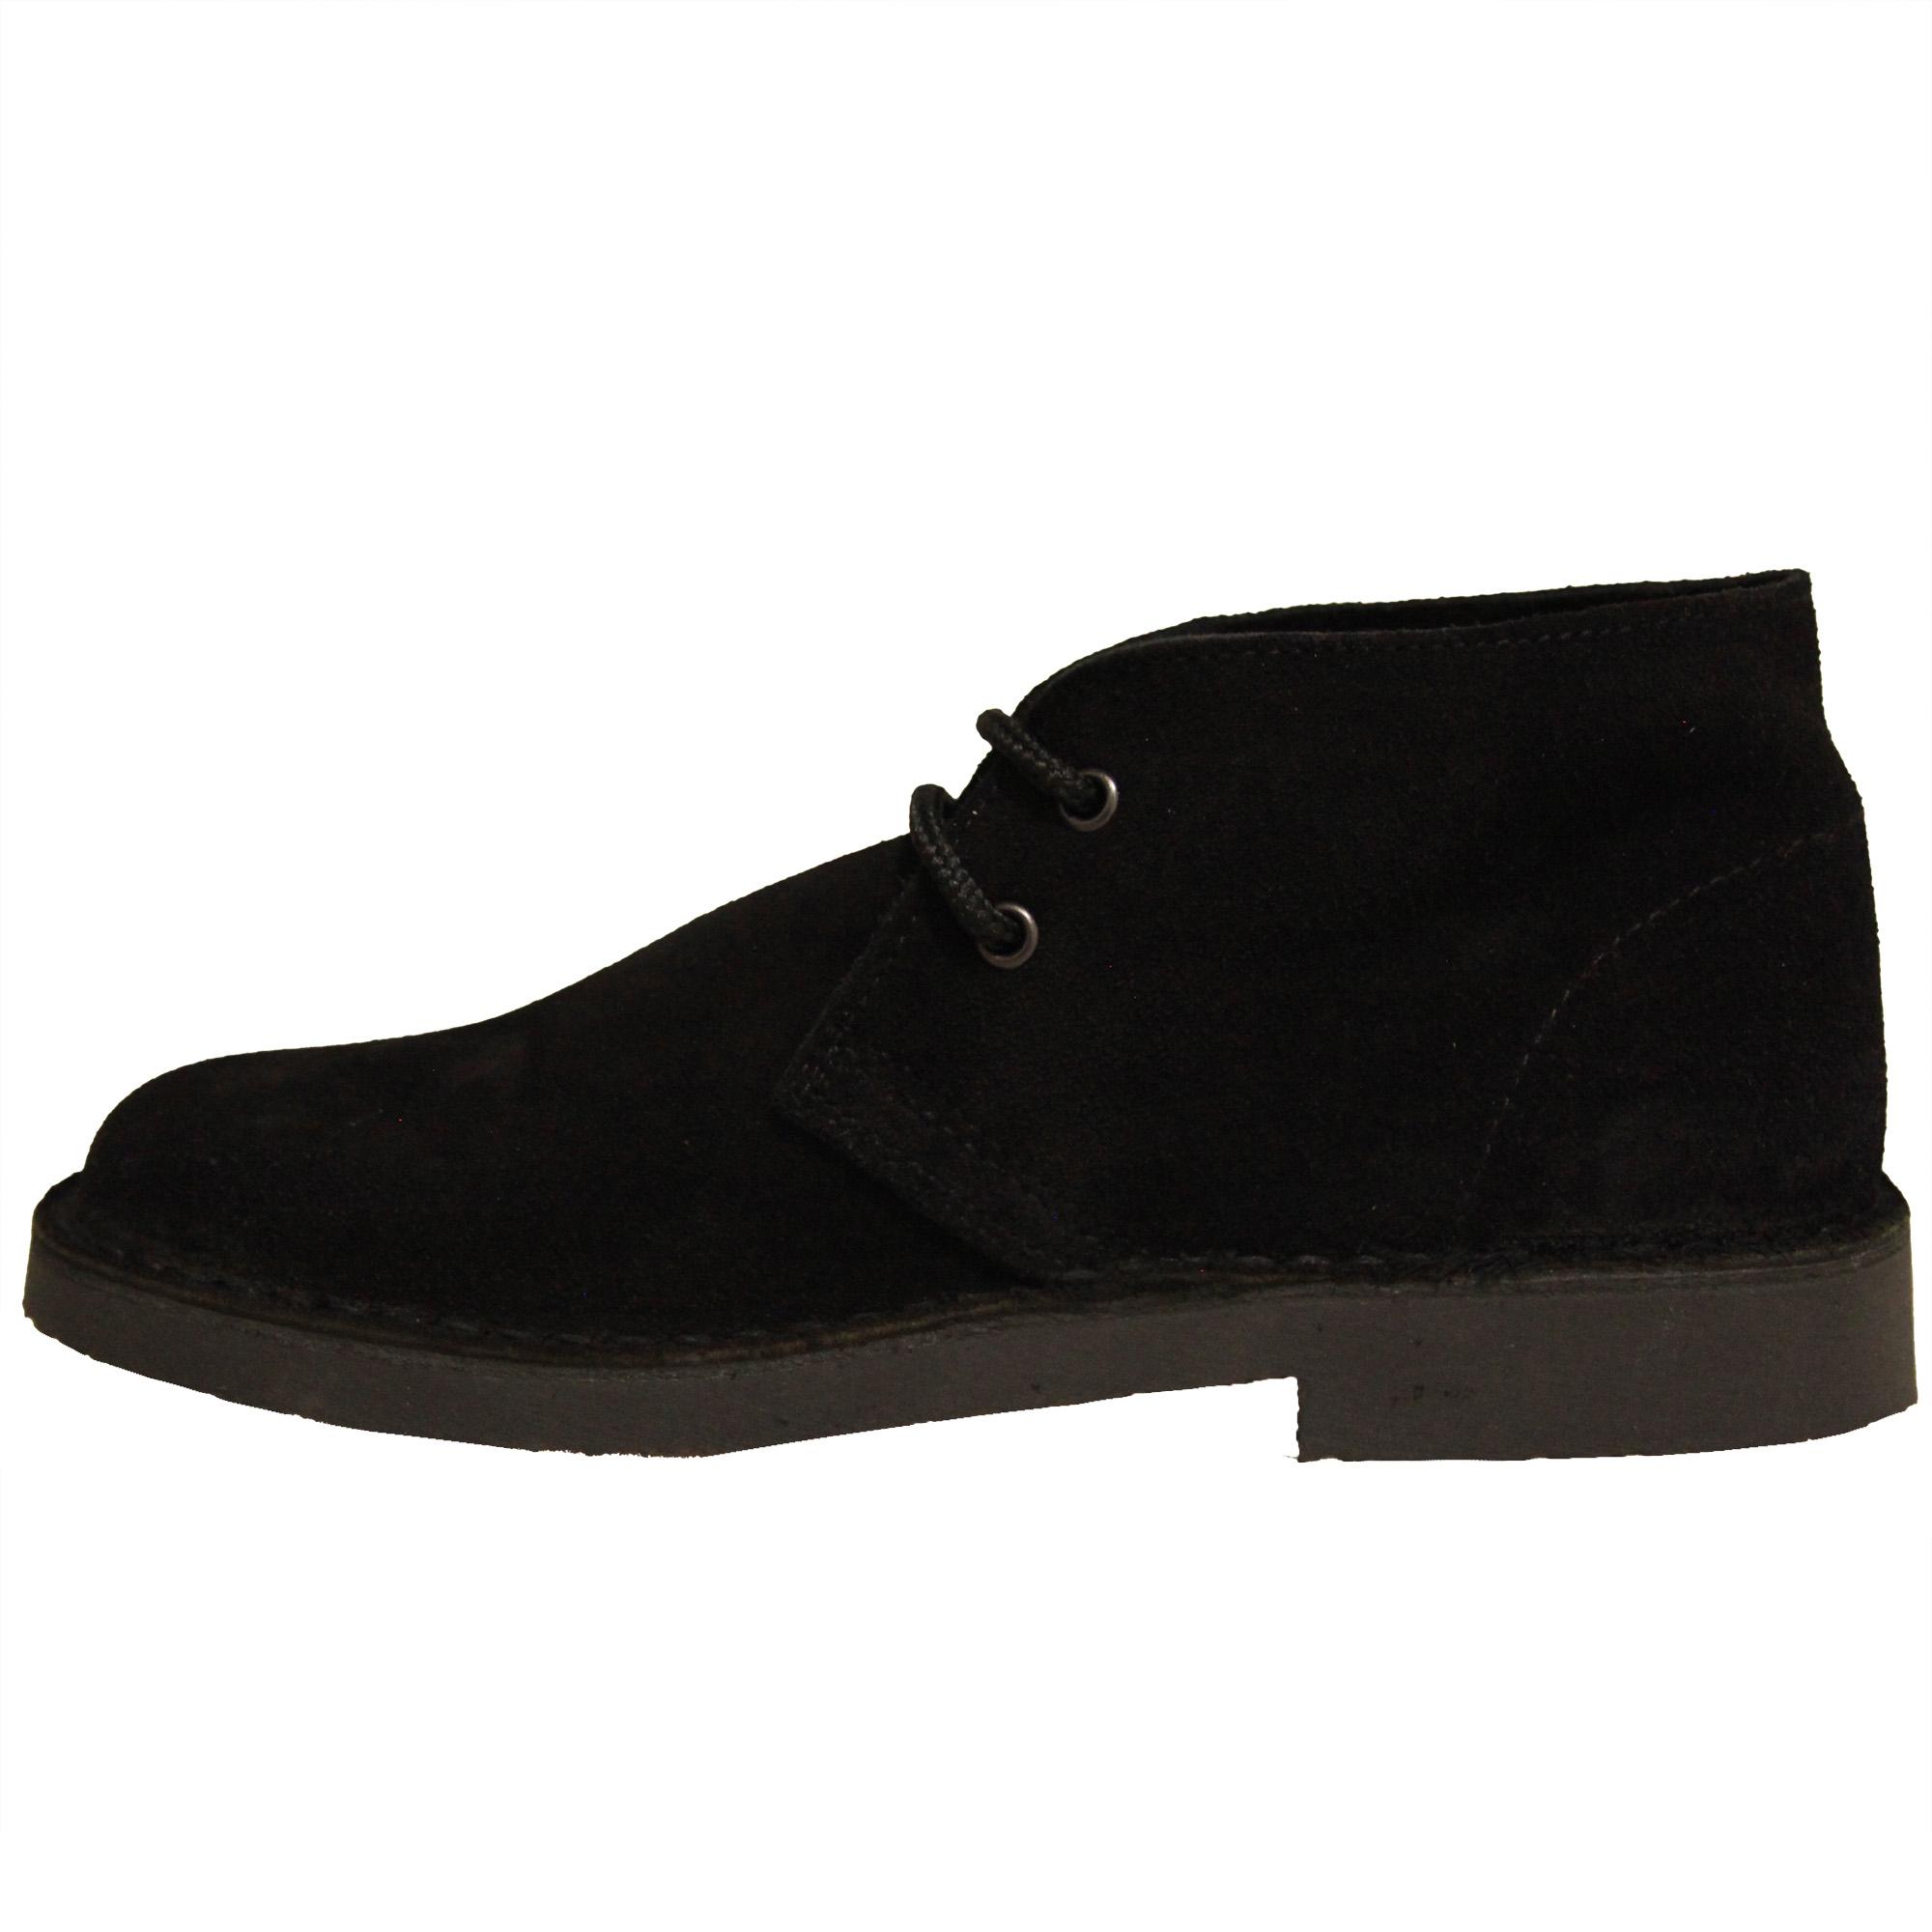 Roamers Mens Real Suede Unlined Desert Boots (6 UK) (Grey)